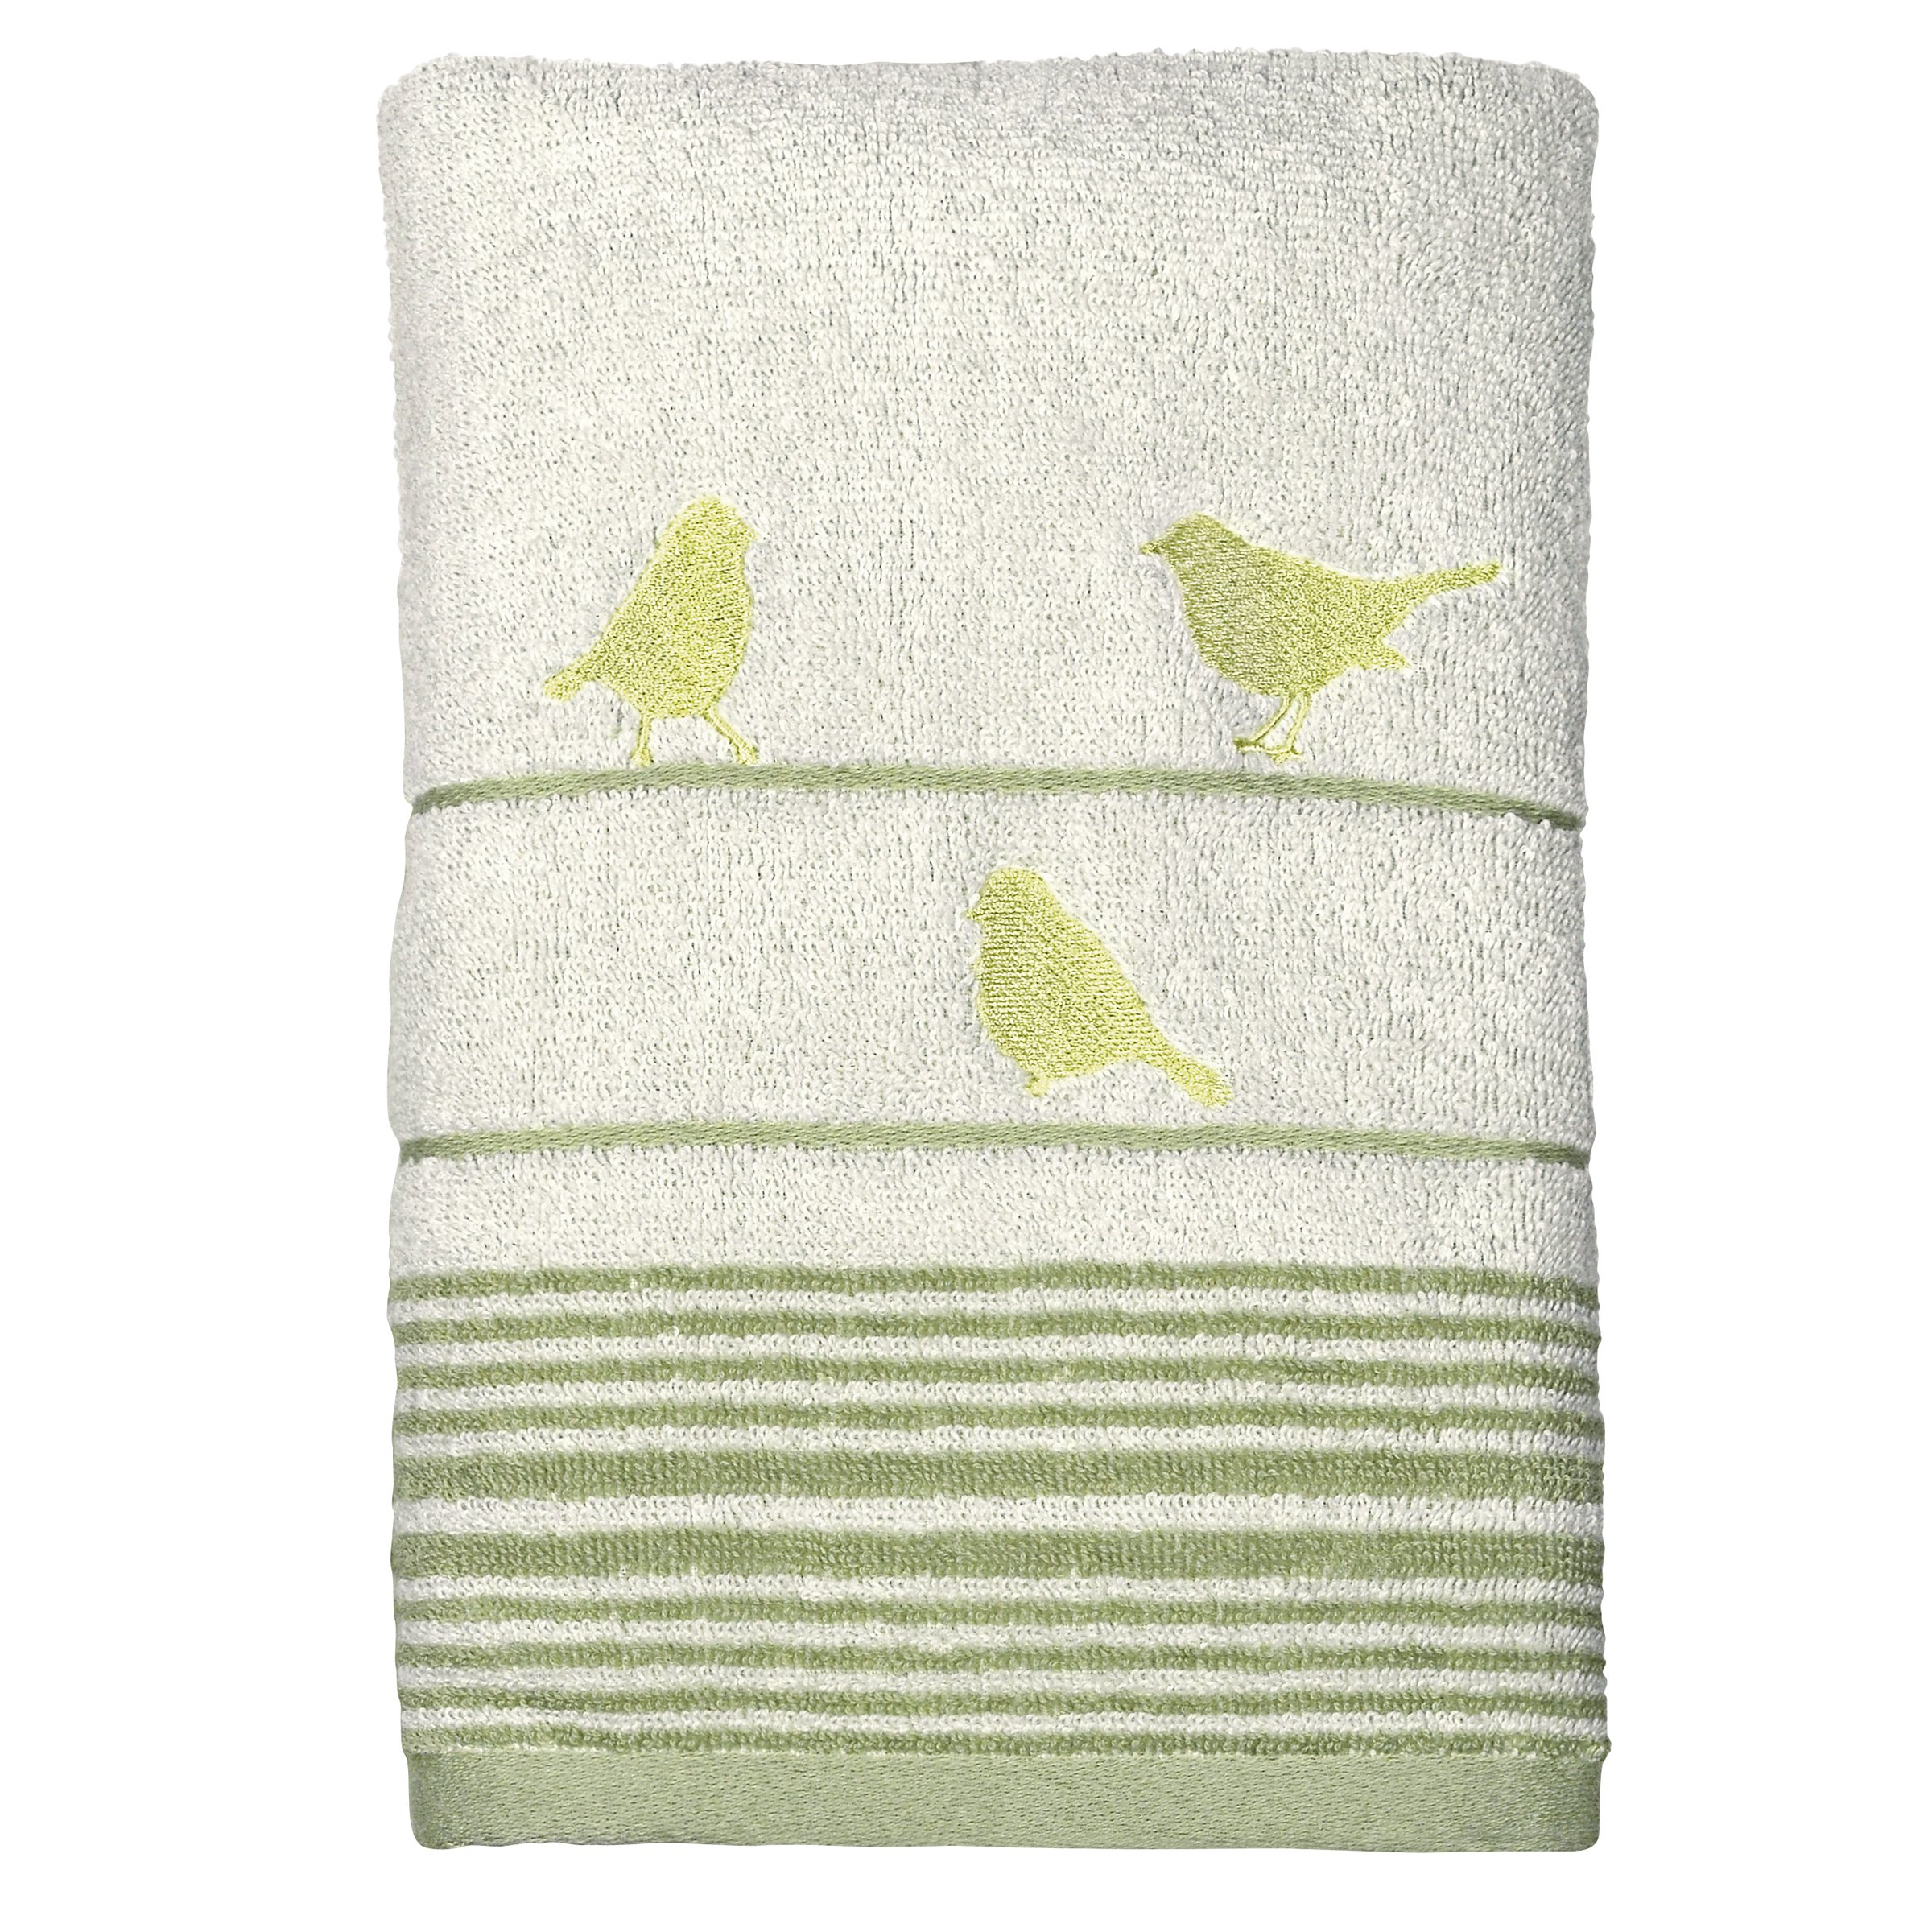 Peri Home Little Birds Hand Towel, 100Percent Cotton, Green, 15''x 26'', Bordered